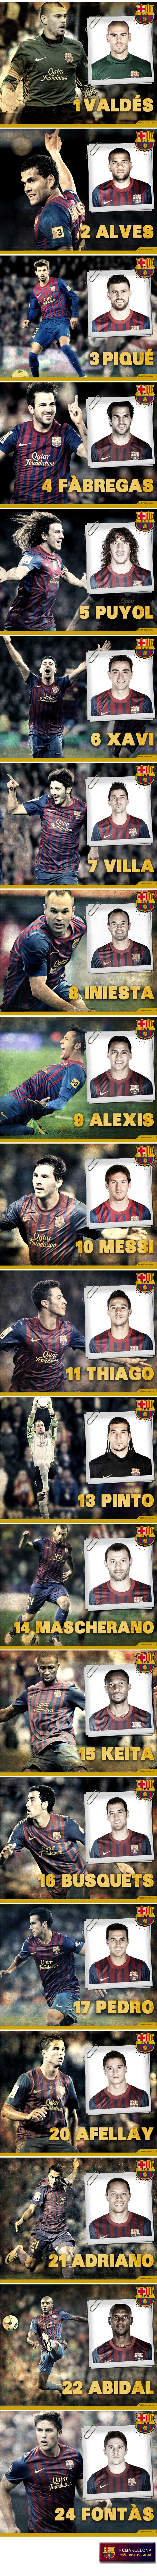 FC Barcelona 2011-2012  www.supersoccersite.com